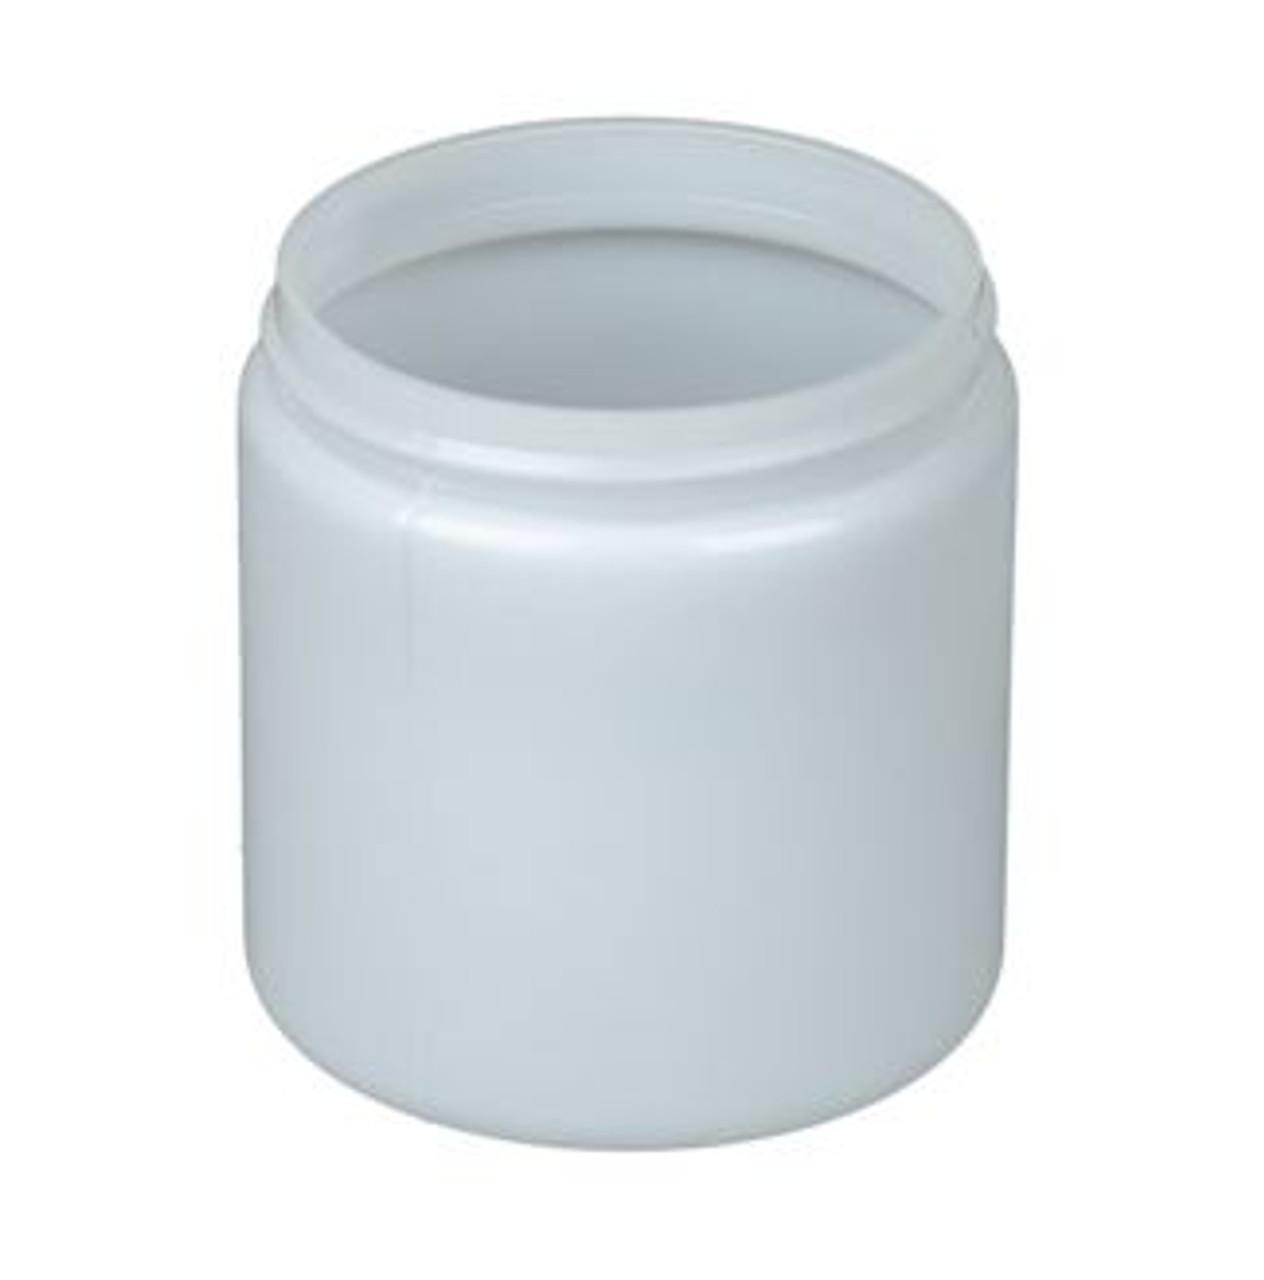 8 oz Natural HDPE Wide Mouth Jar